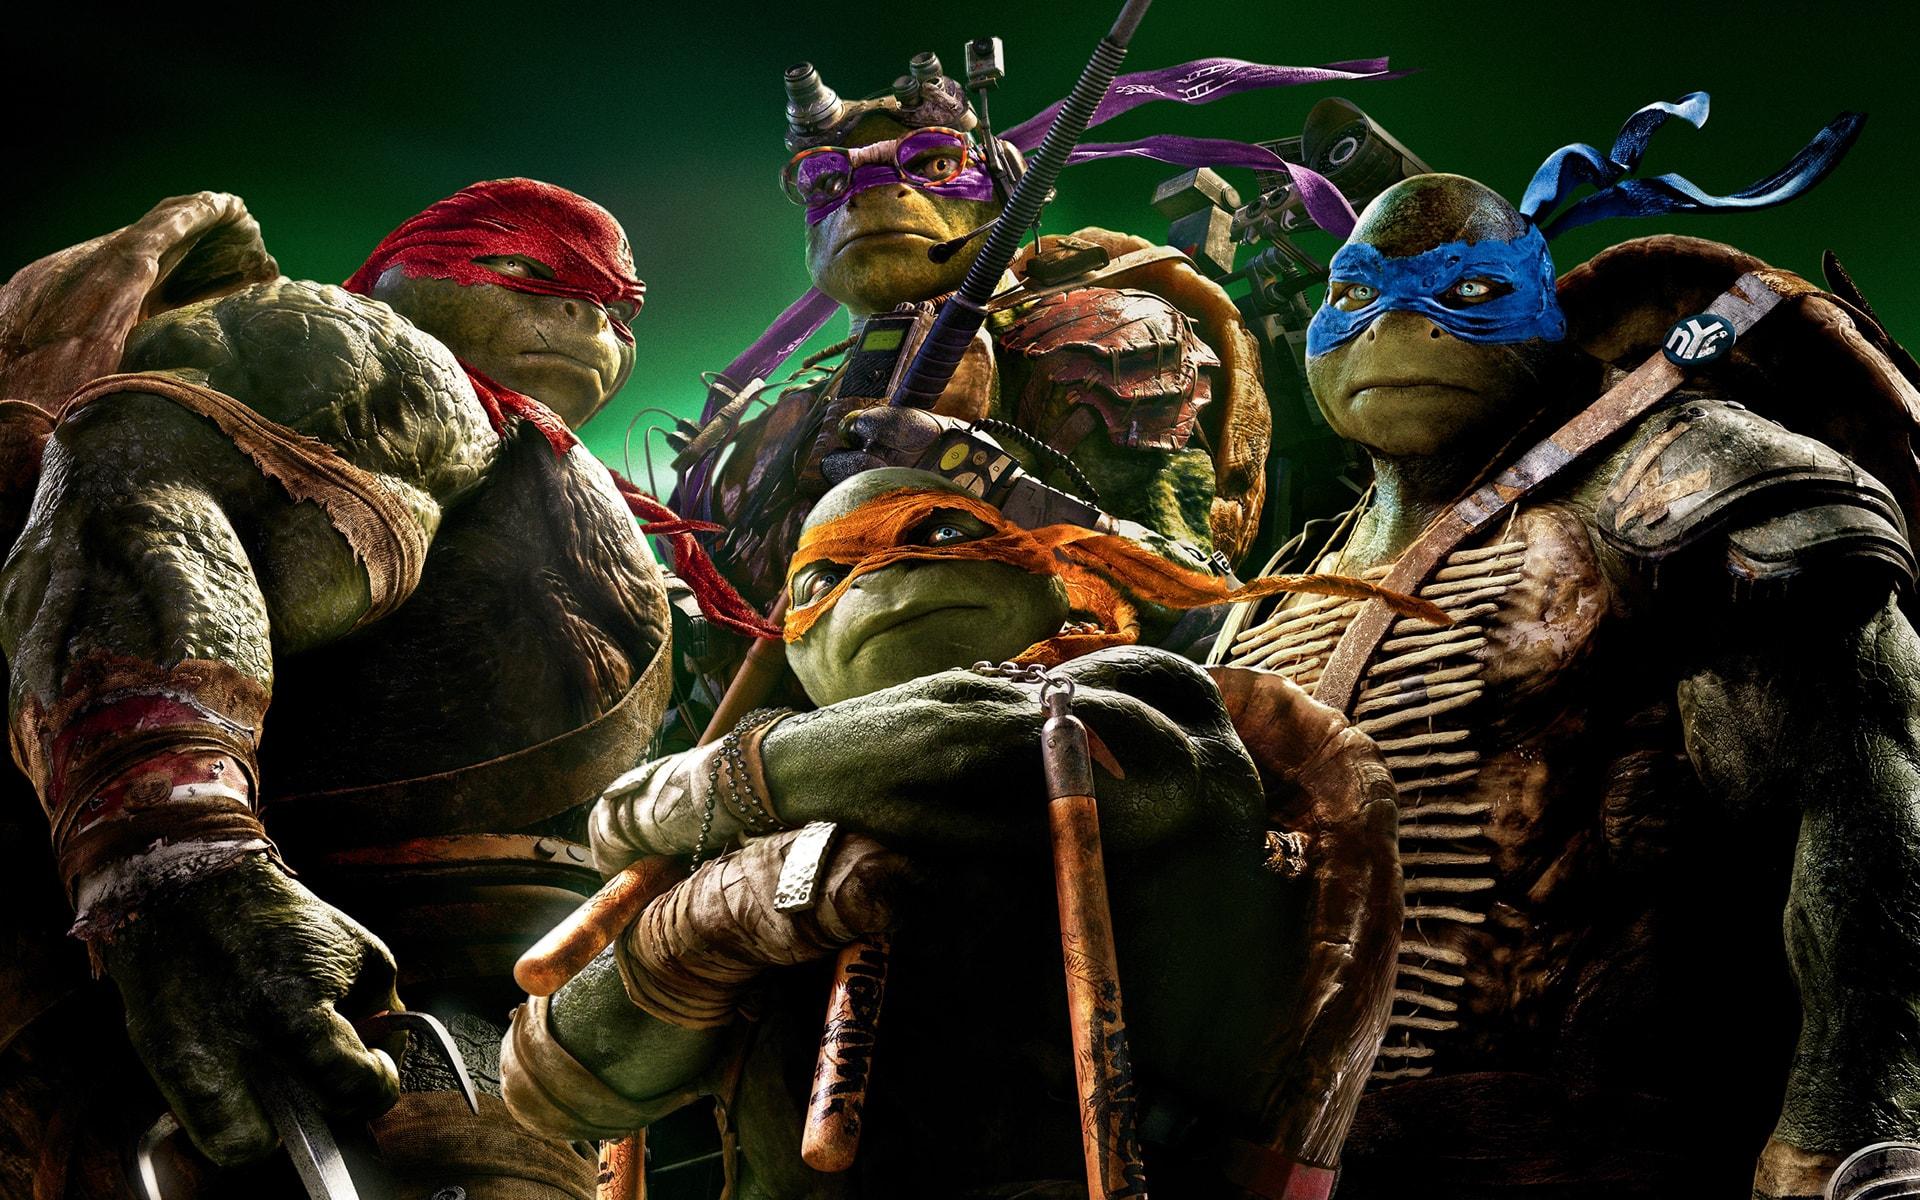 Teenage Mutant Ninja Turtles widescreen wallpapers